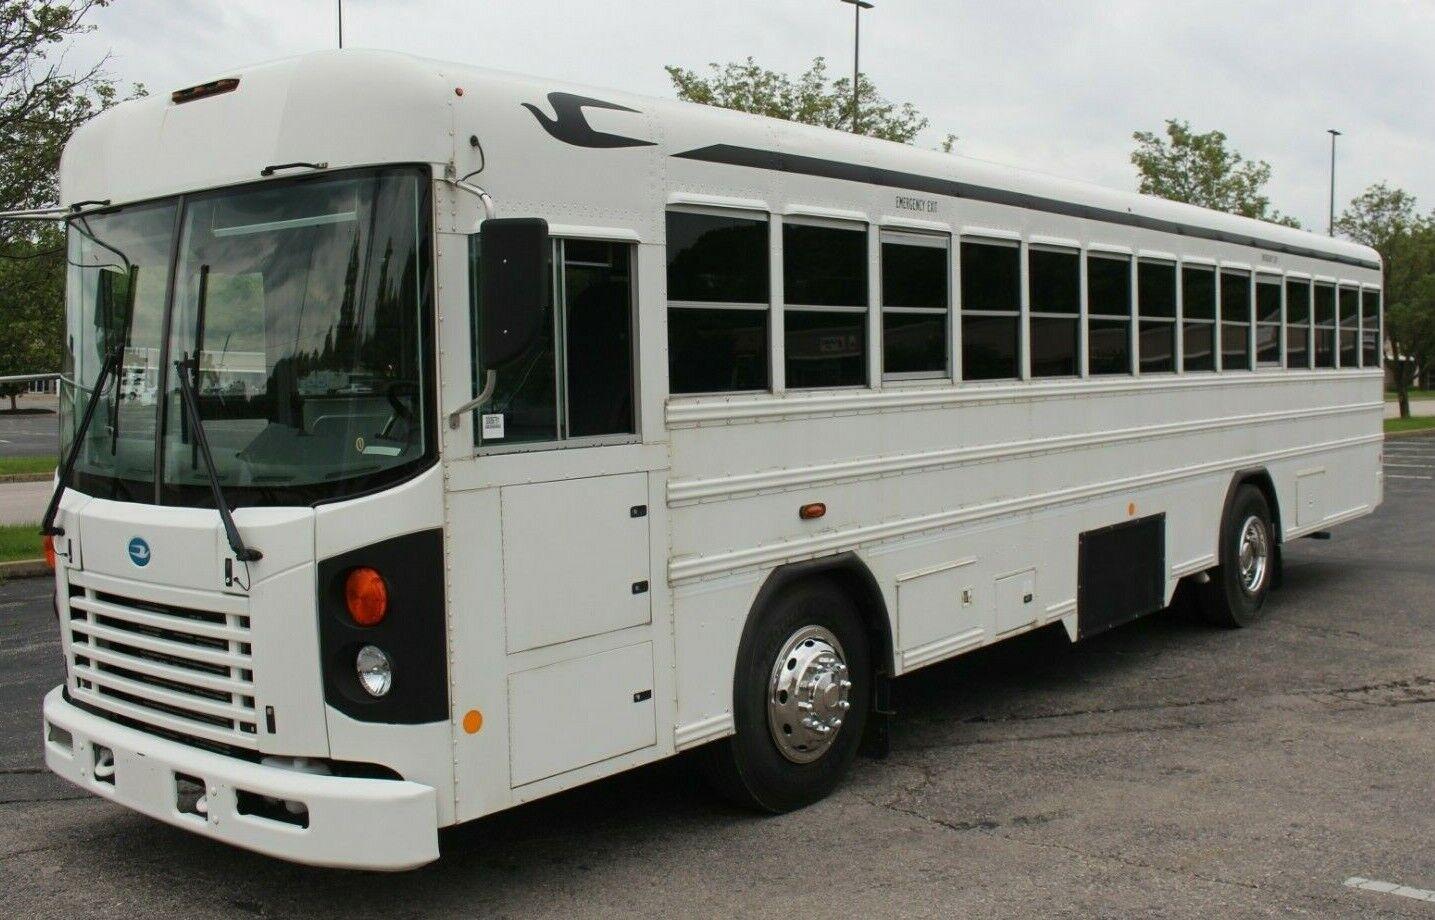 2010 Blue Bird School Activity Bus Cummins Diesel Skoolie RV Shuttle 26K Miles